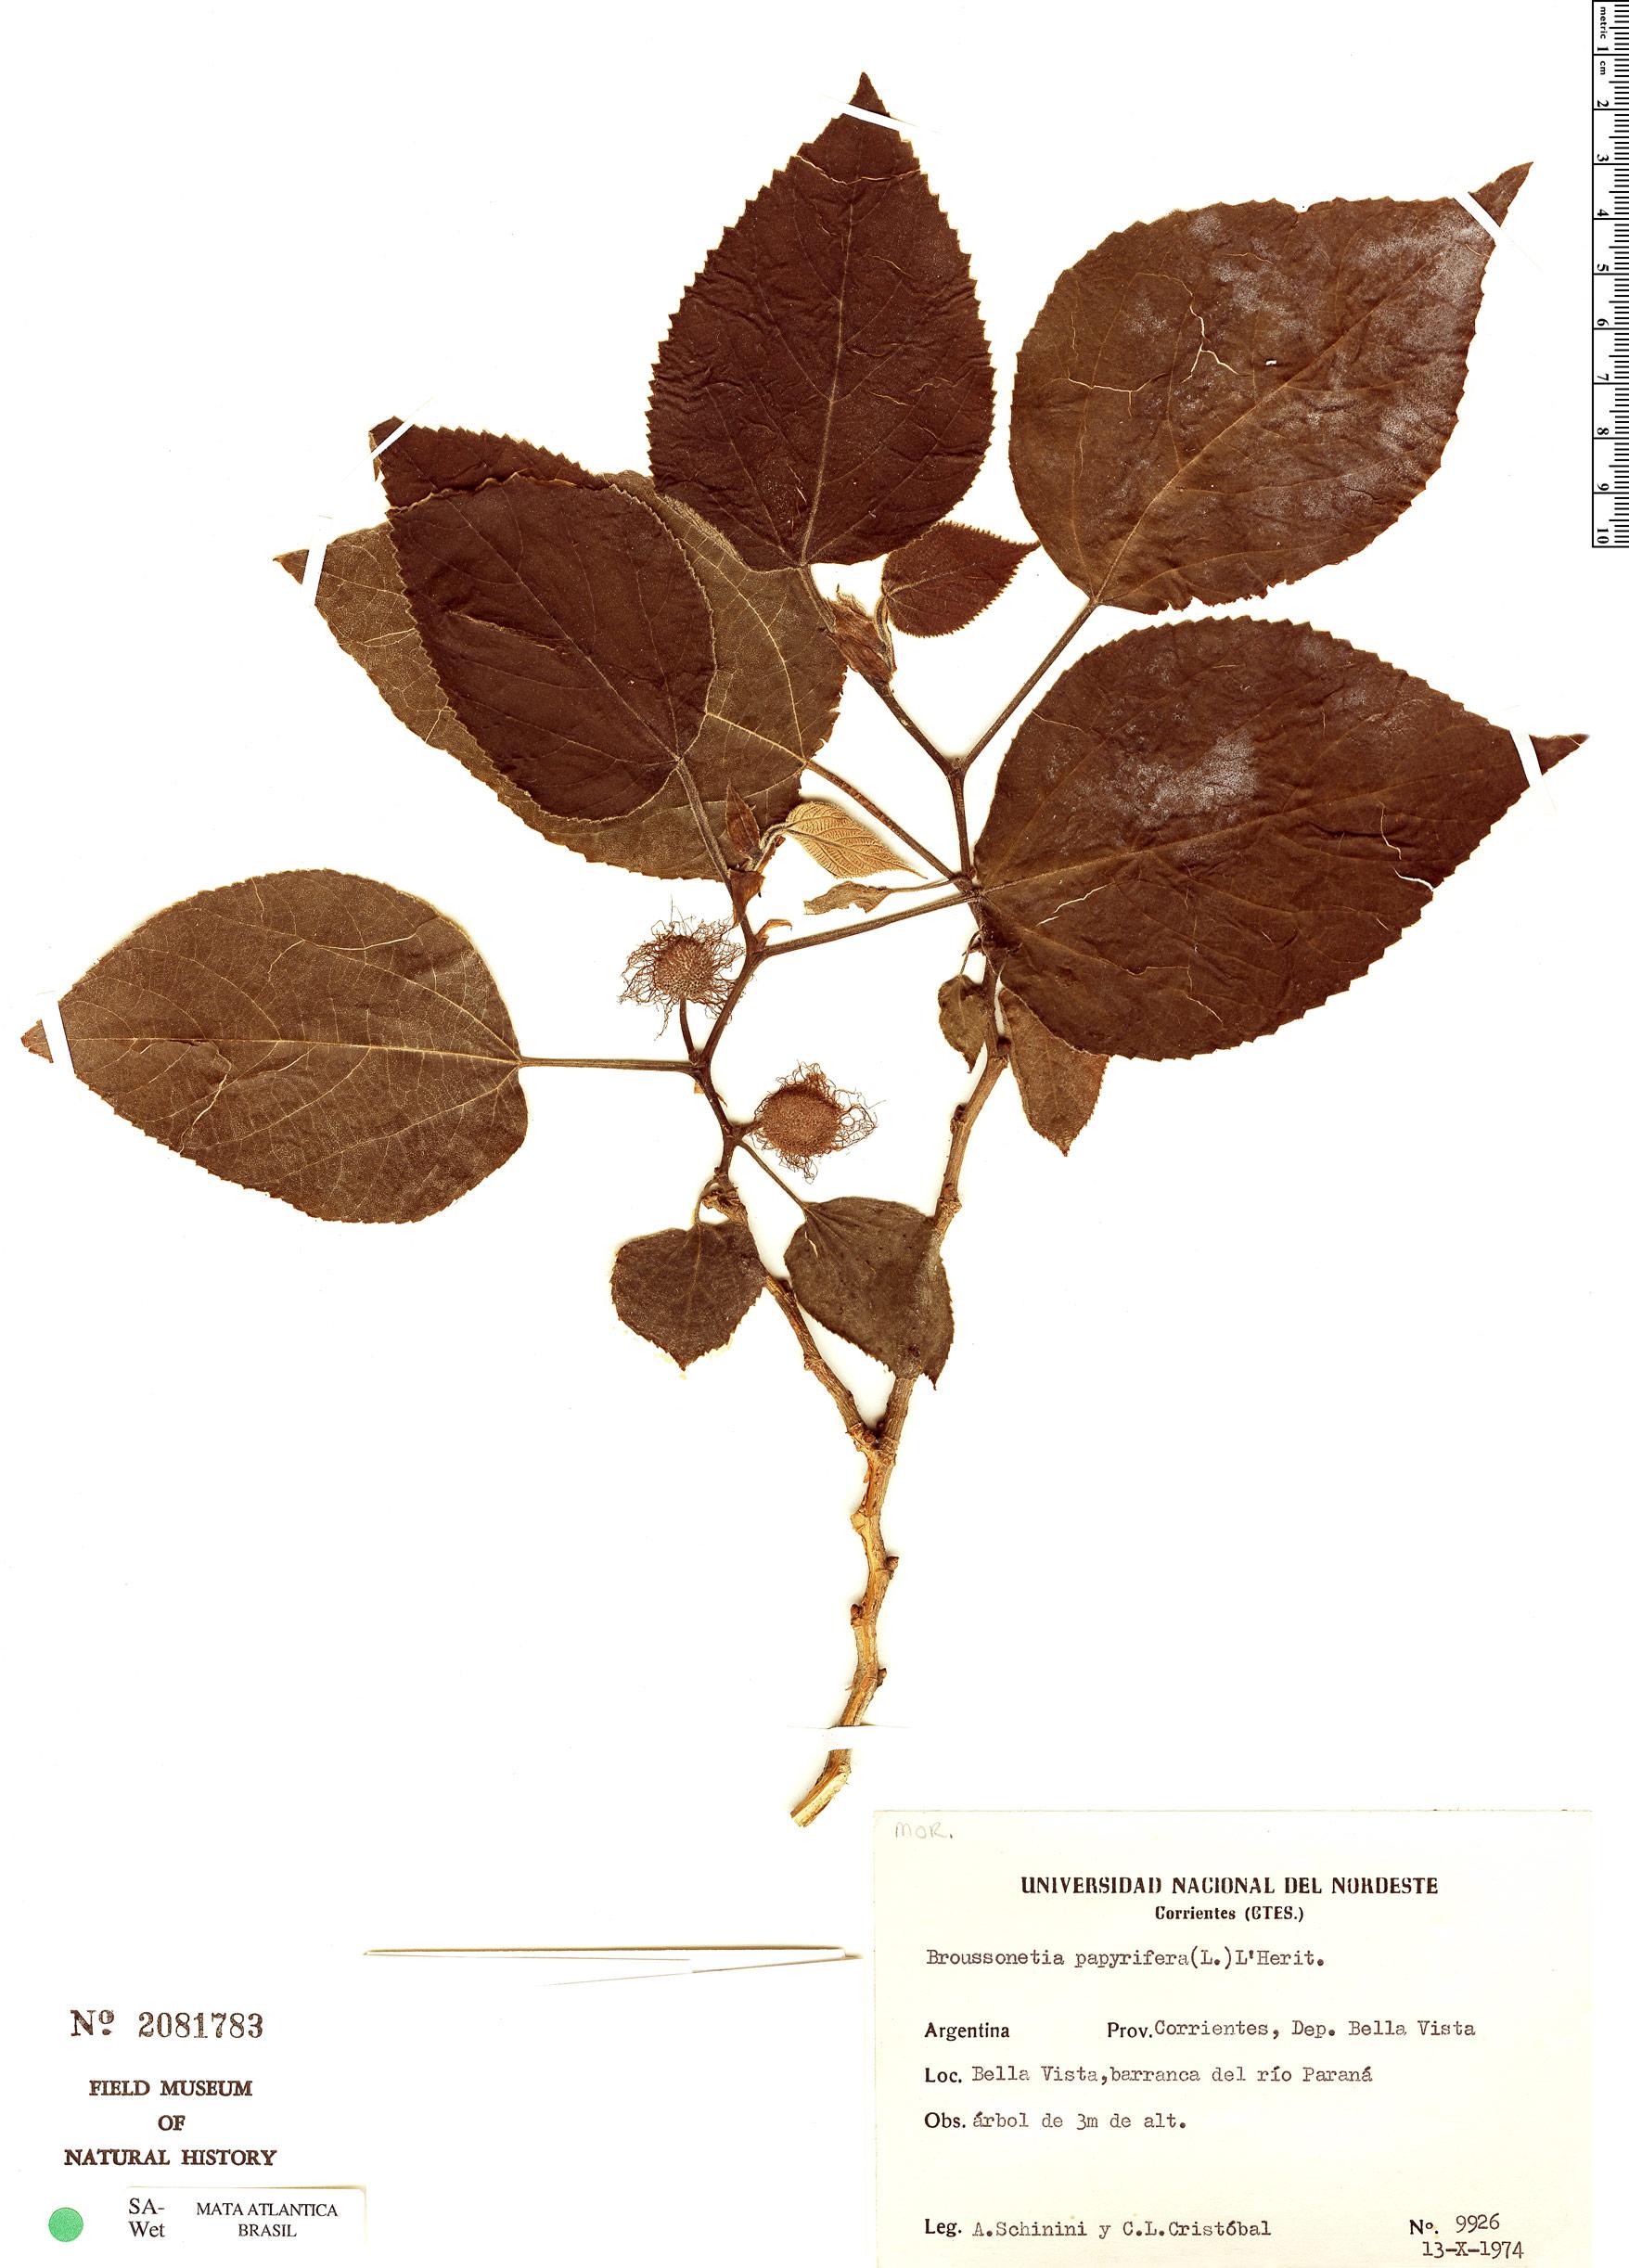 Specimen: Broussonetia papyrifera